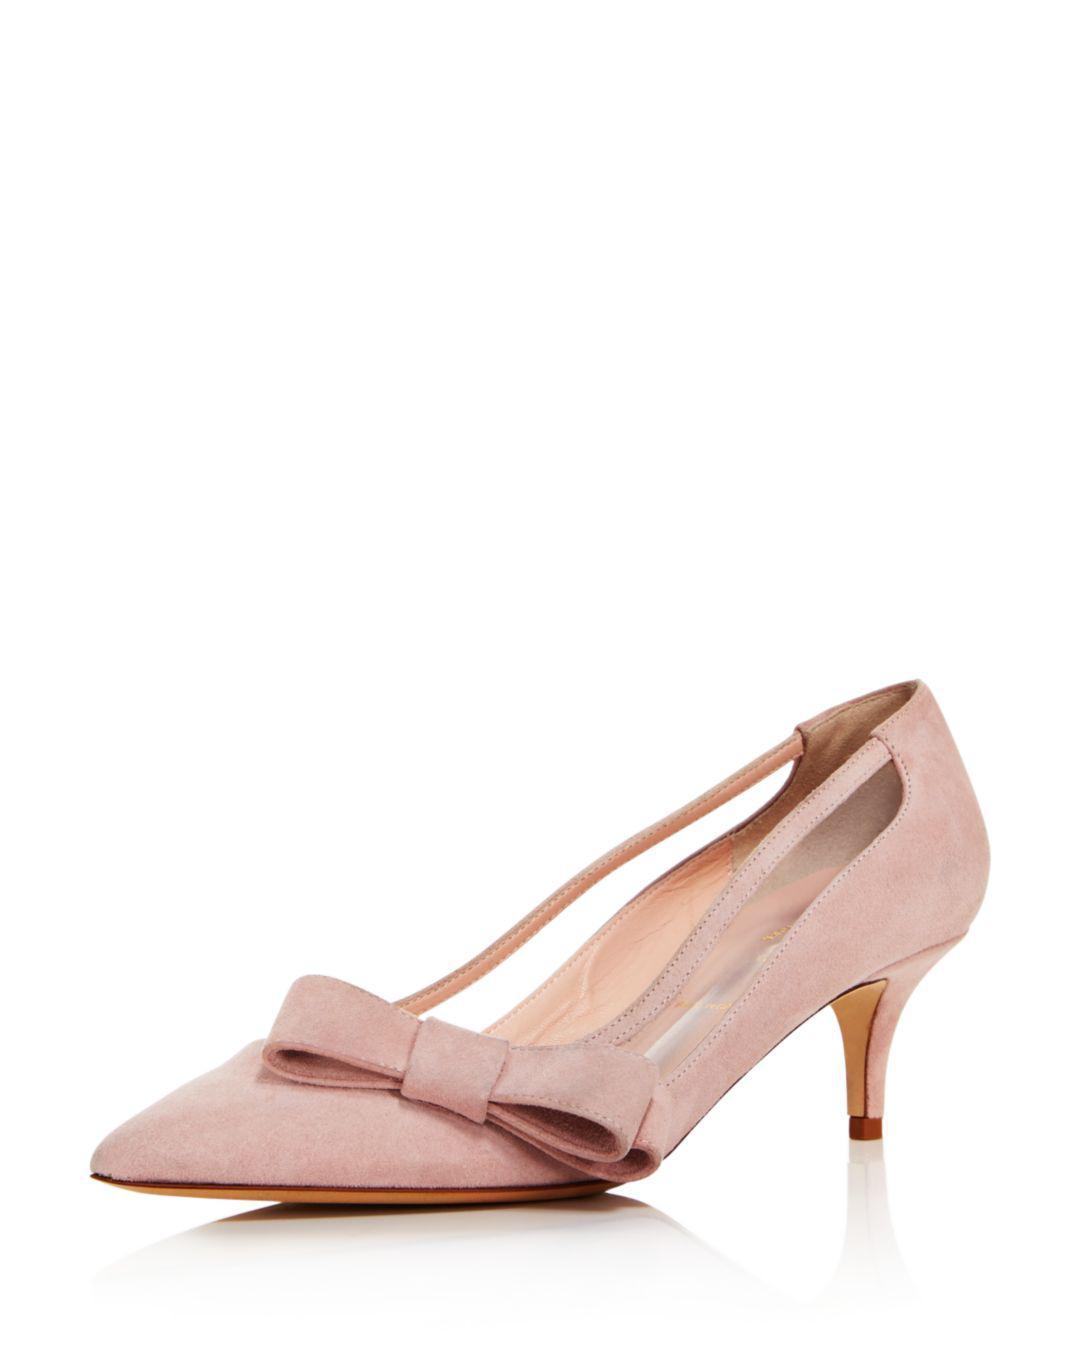 12e47462d14d Kate Spade Women's Mackenzie Suede Bow Mid-heel Pumps in Pink - Lyst